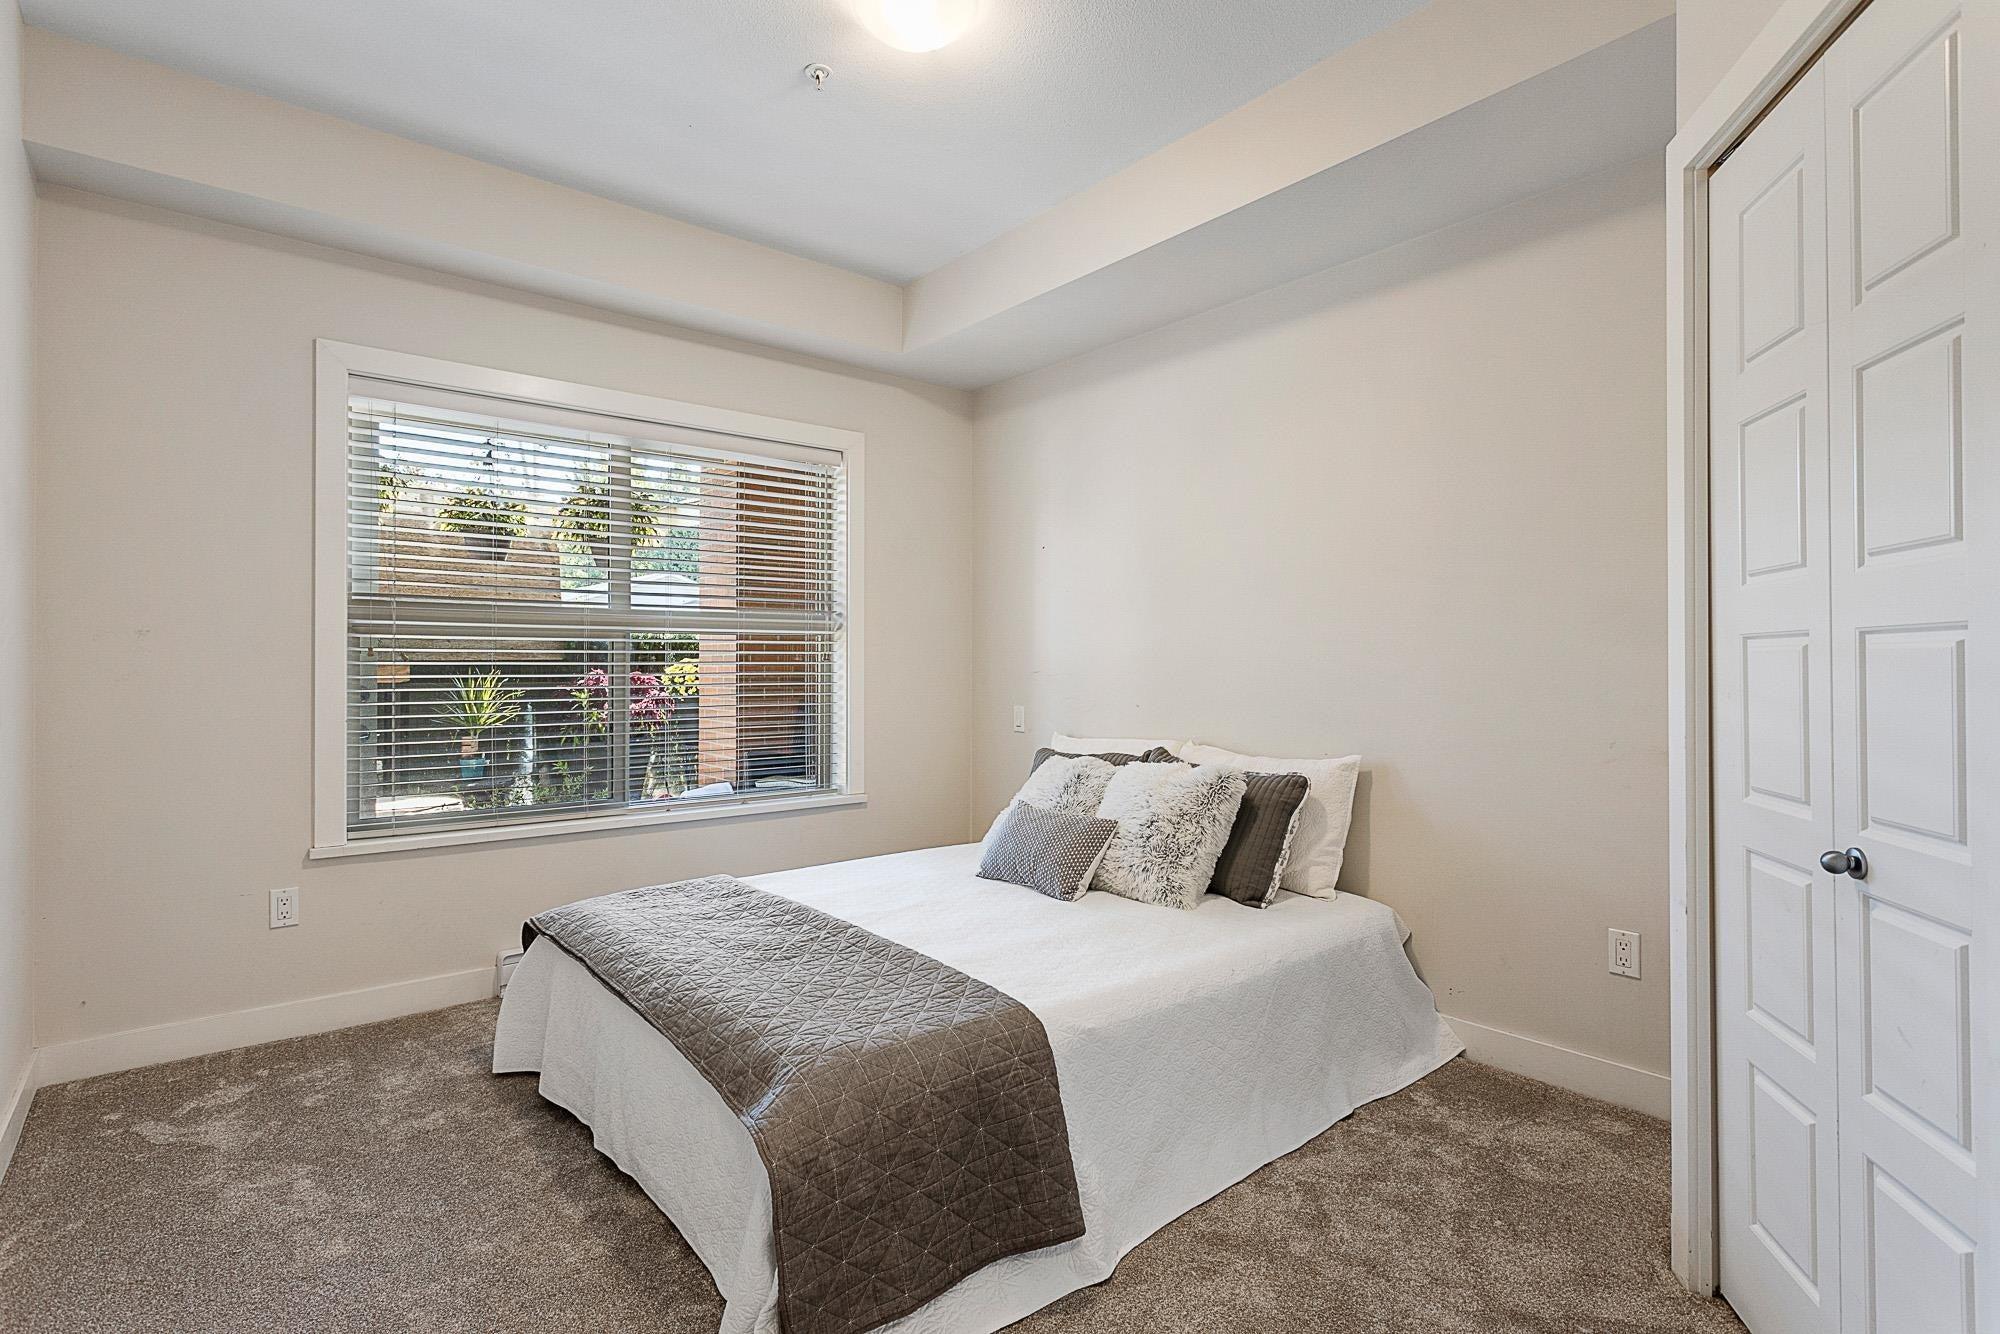 114 20219 54A AVENUE - Langley City Apartment/Condo for sale, 1 Bedroom (R2616172) - #17